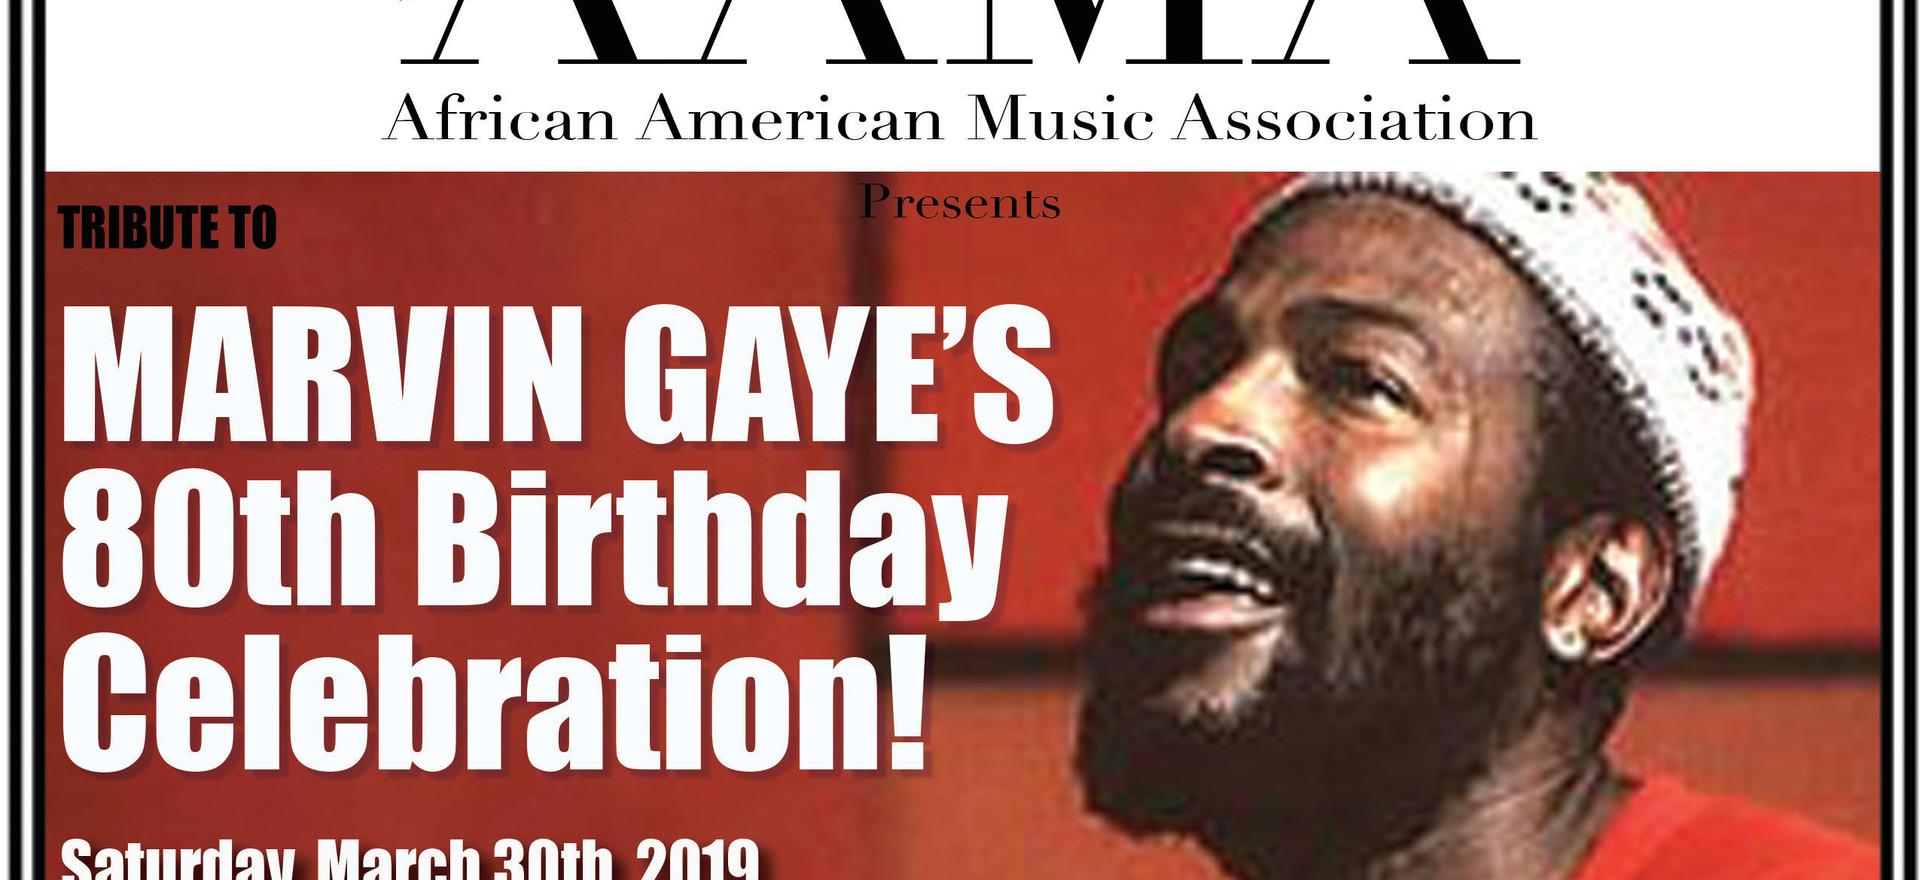 Marvin Gaye - Social2.jpg